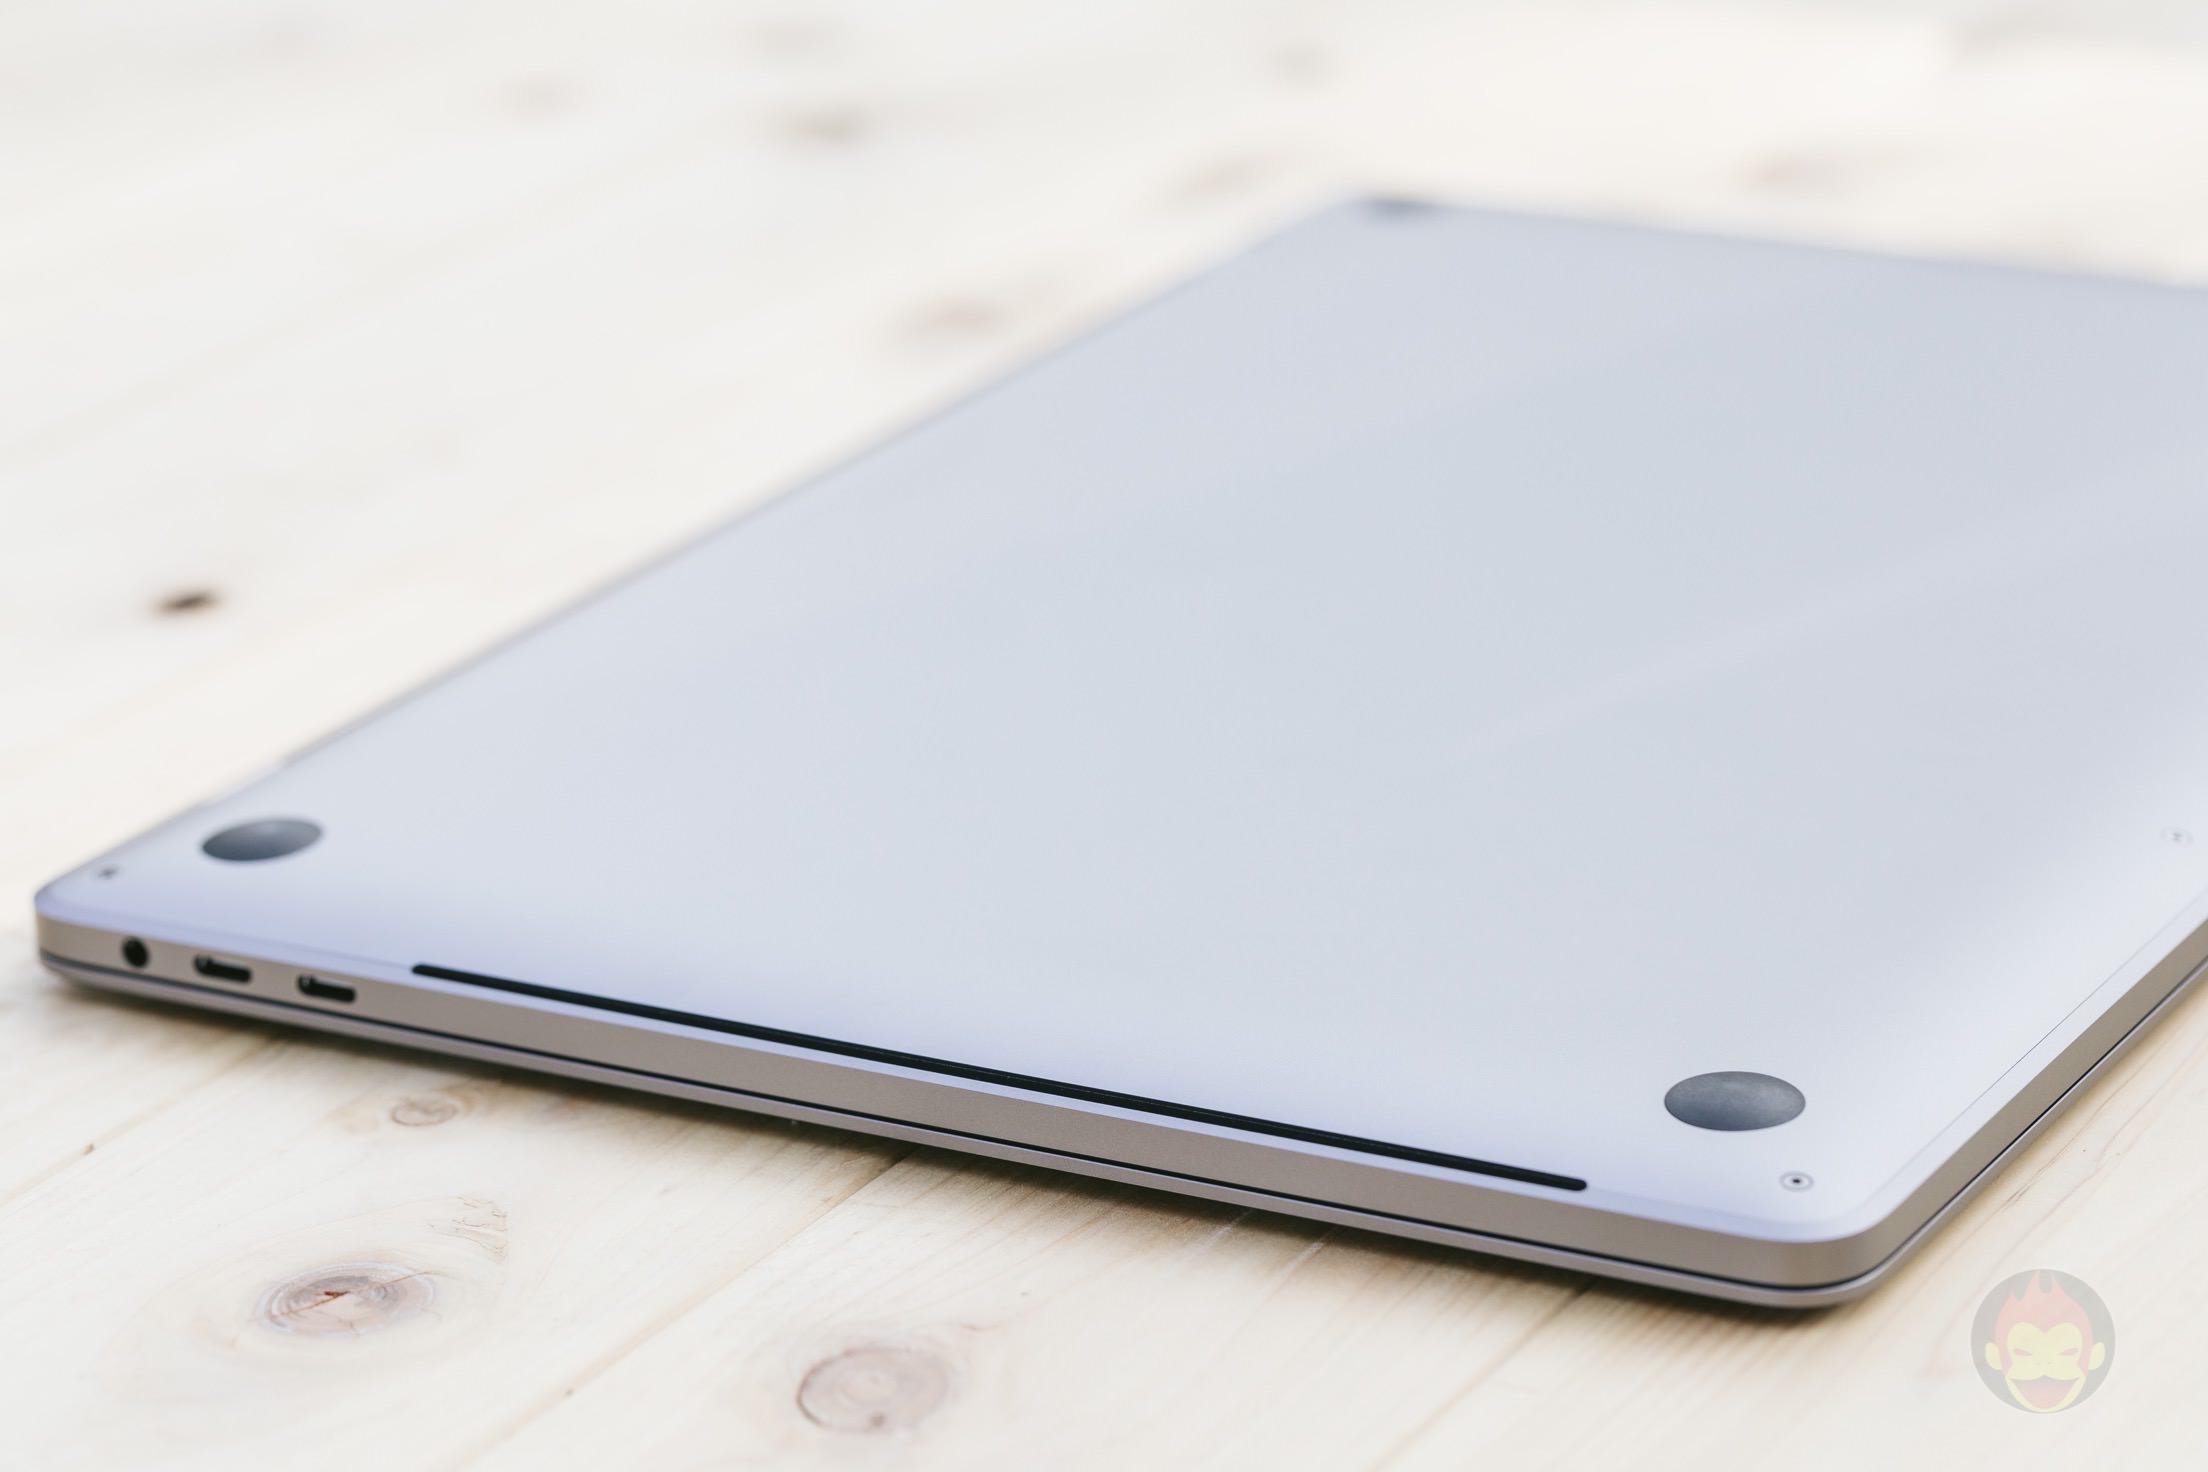 MacBook-Pro-Late2016-15inch-model-photos-09.jpg